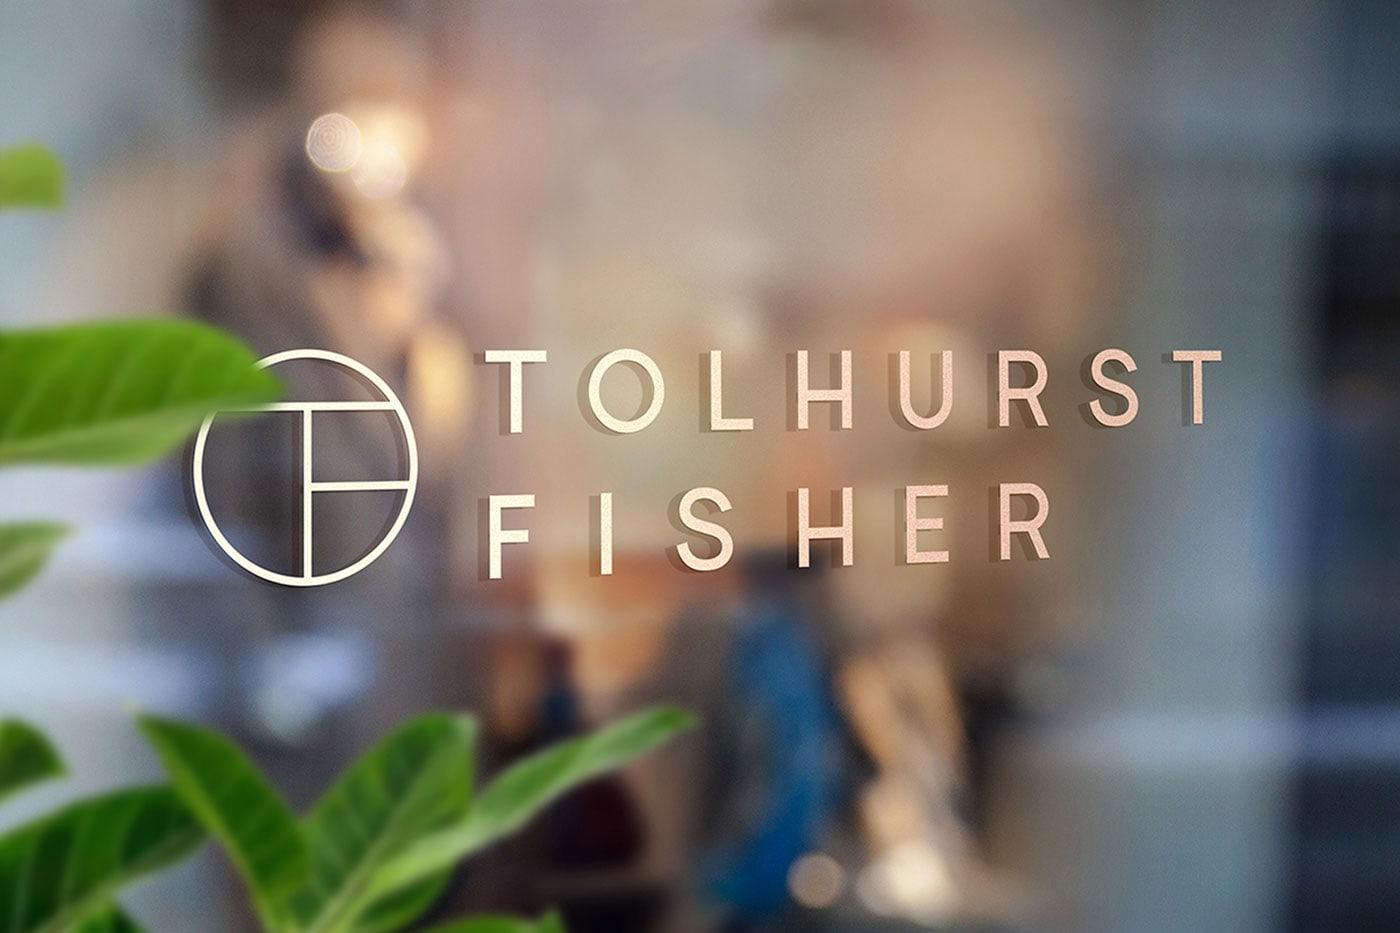 Tolhurst Fisher律师事务所品牌形象设计